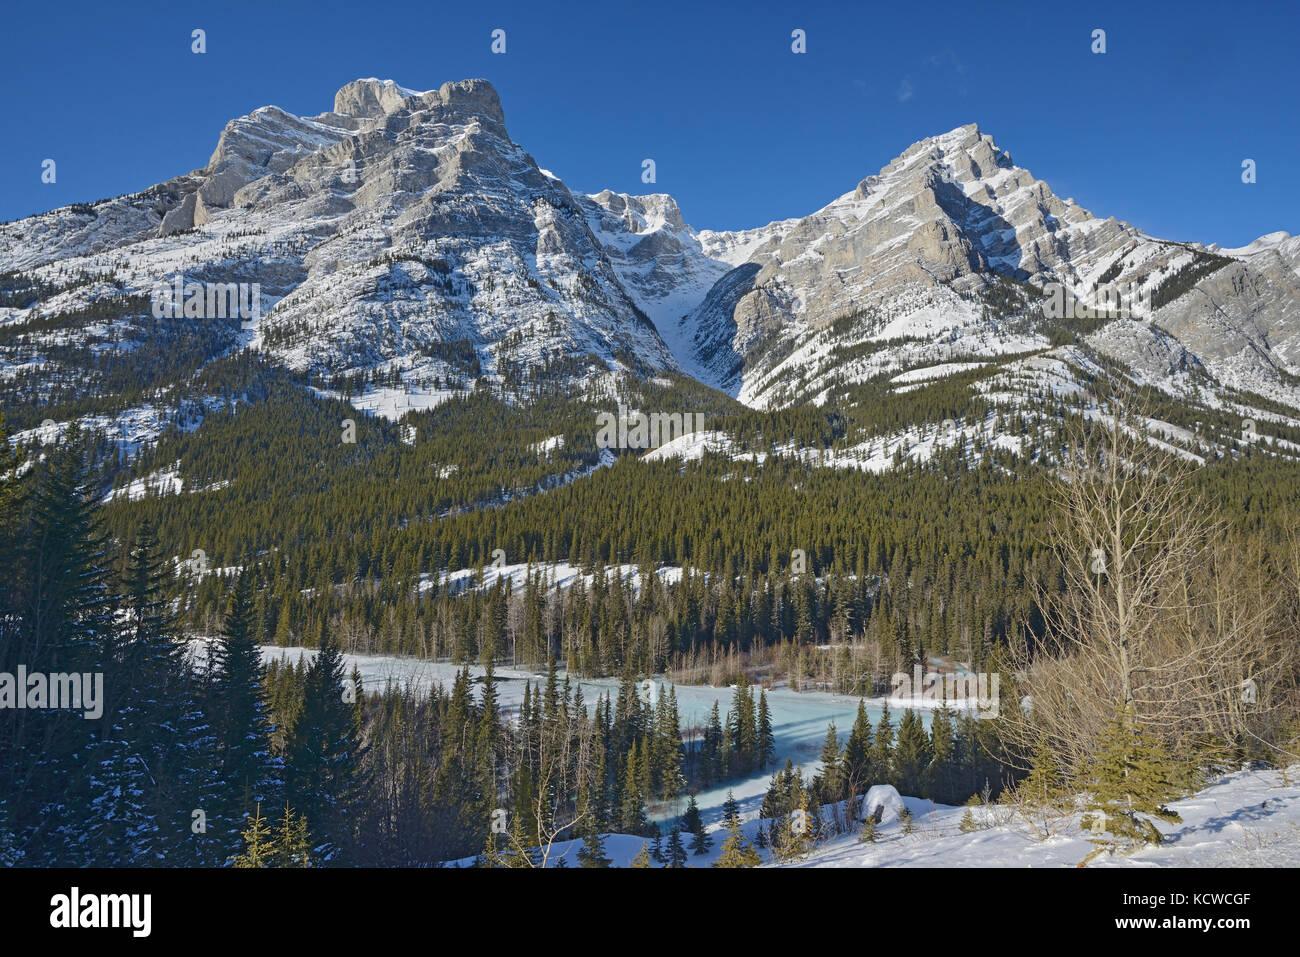 Canadian Rockies in winter, Kananaskis Country, Alberta, Canada - Stock Image